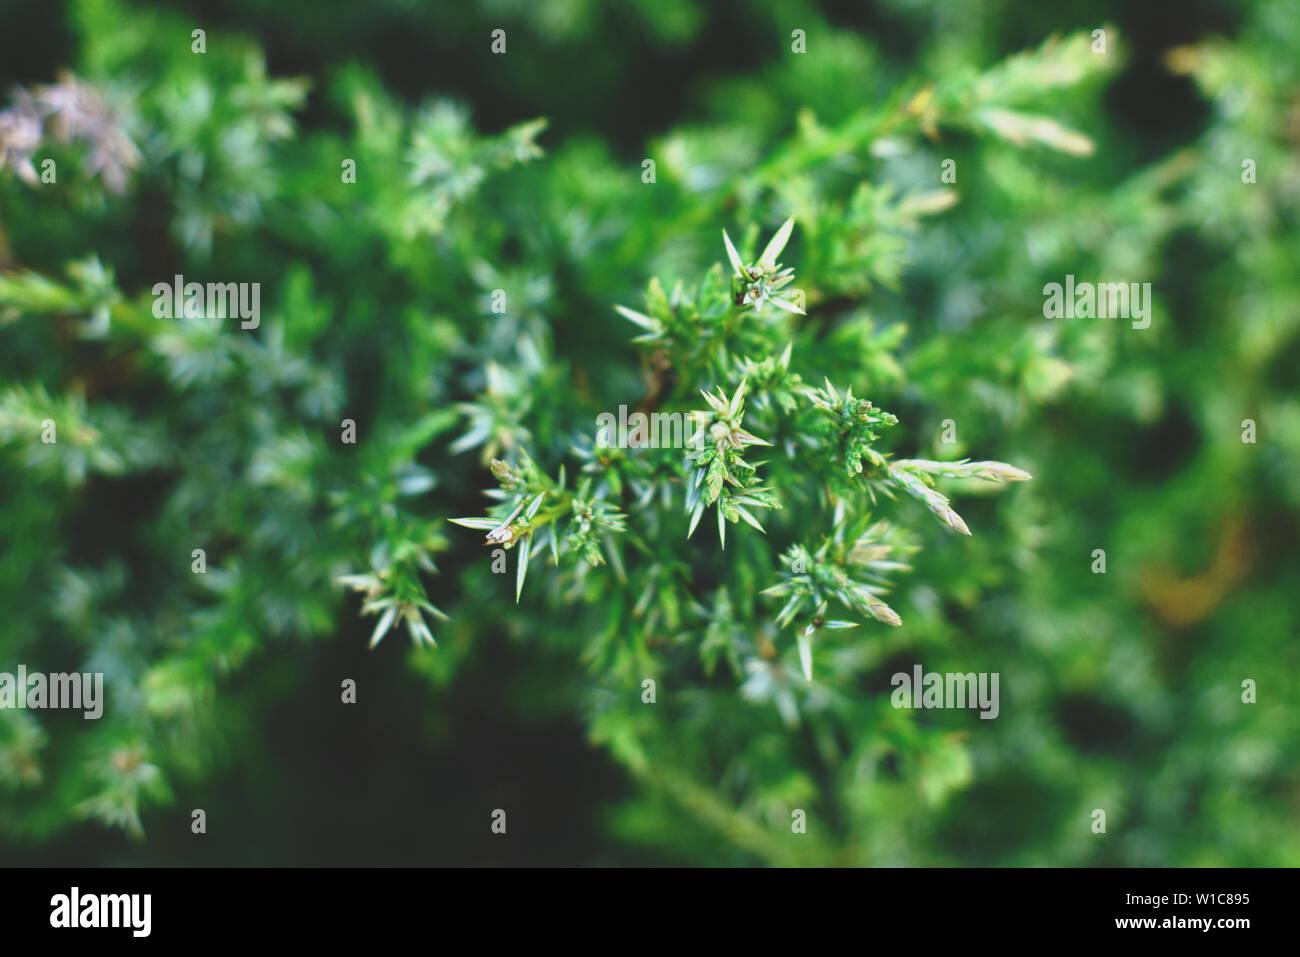 Thuja tree branches, thuja evergreen coniferous tree. - Stock Image